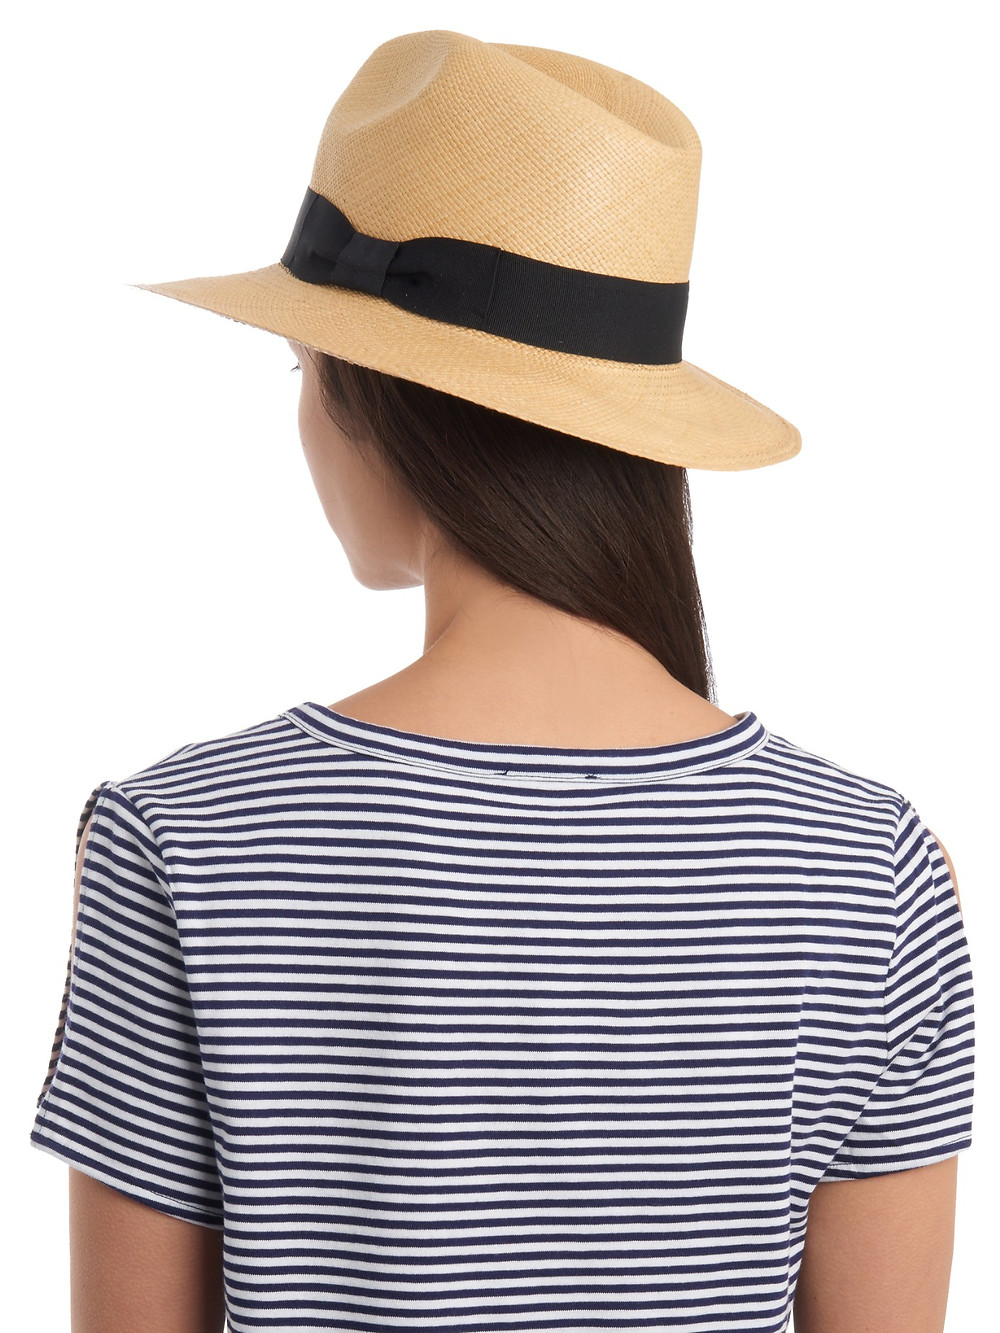 Sensi Studio Panama toquilla-straw hat $120